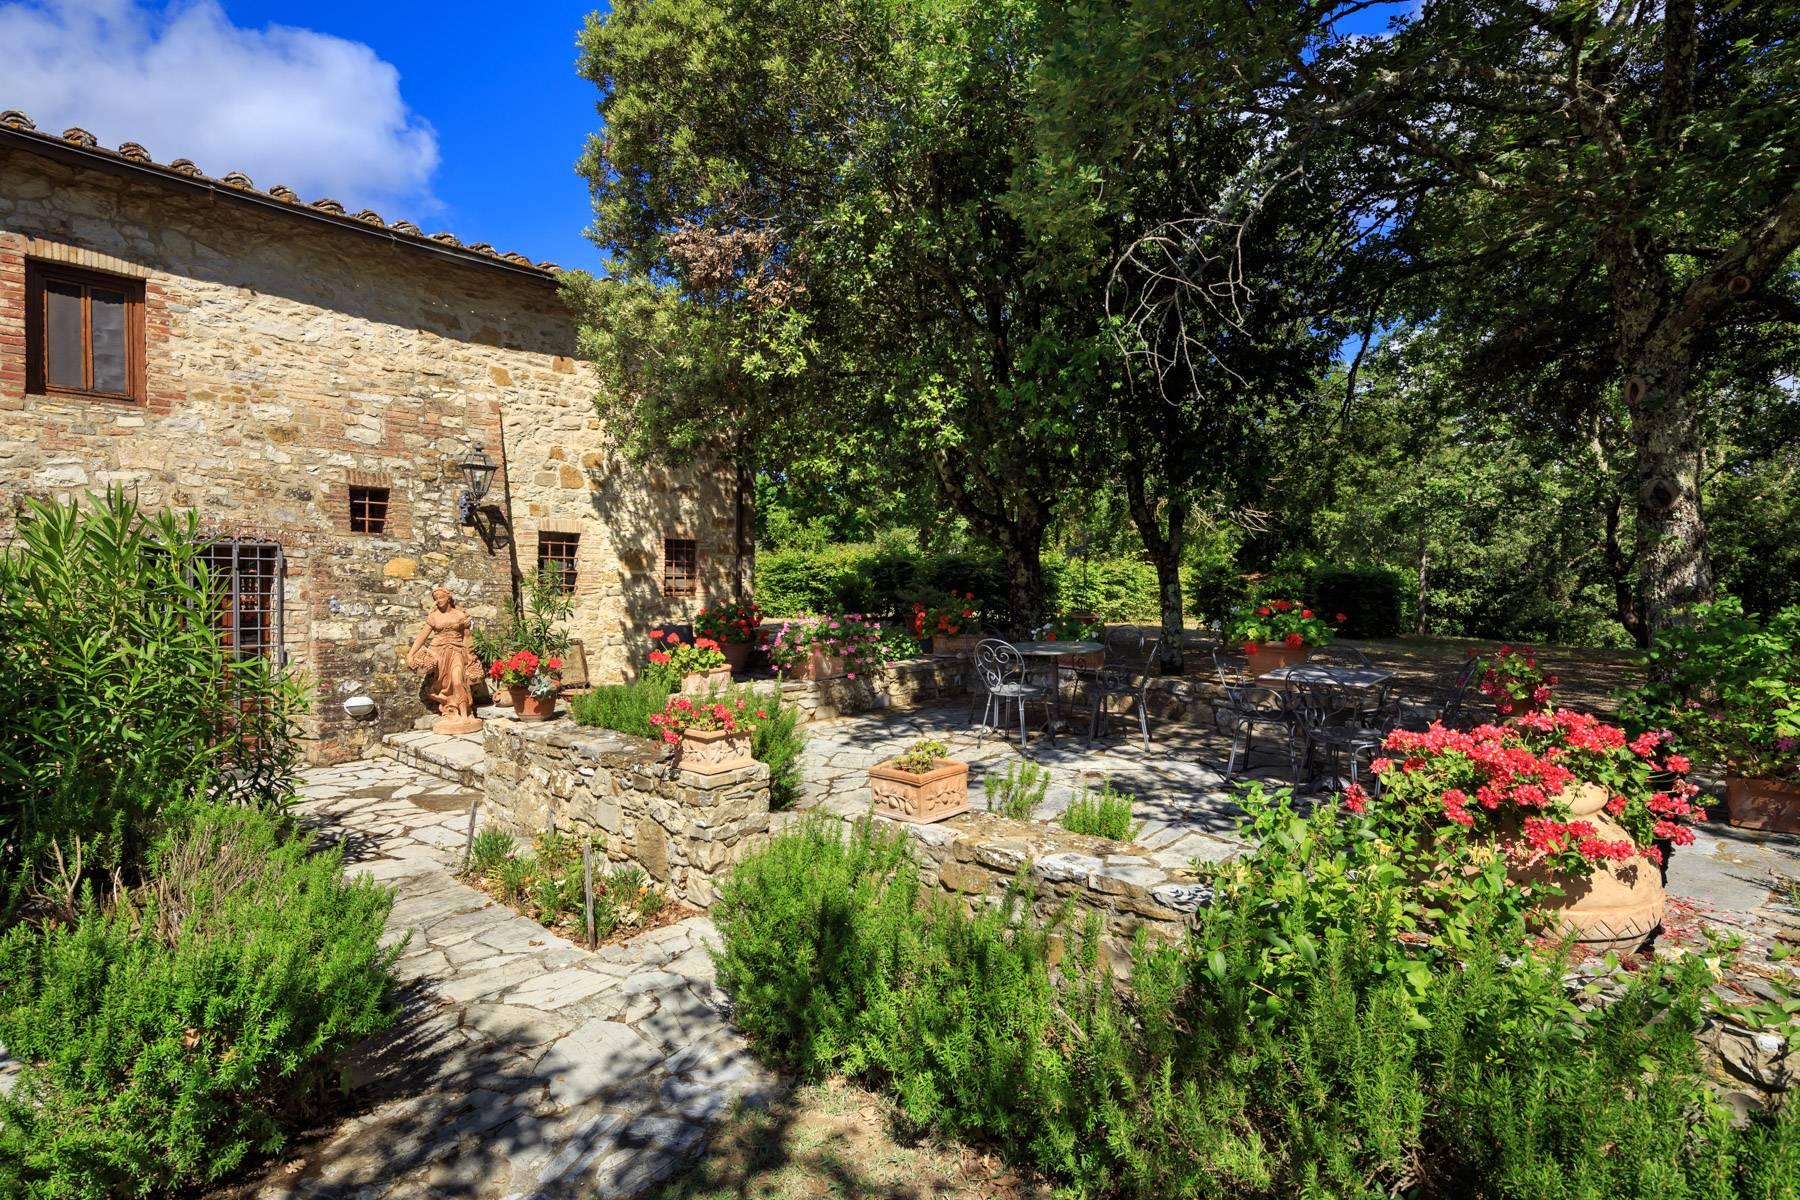 Villa in Vendita a Gaiole In Chianti: 5 locali, 465 mq - Foto 16